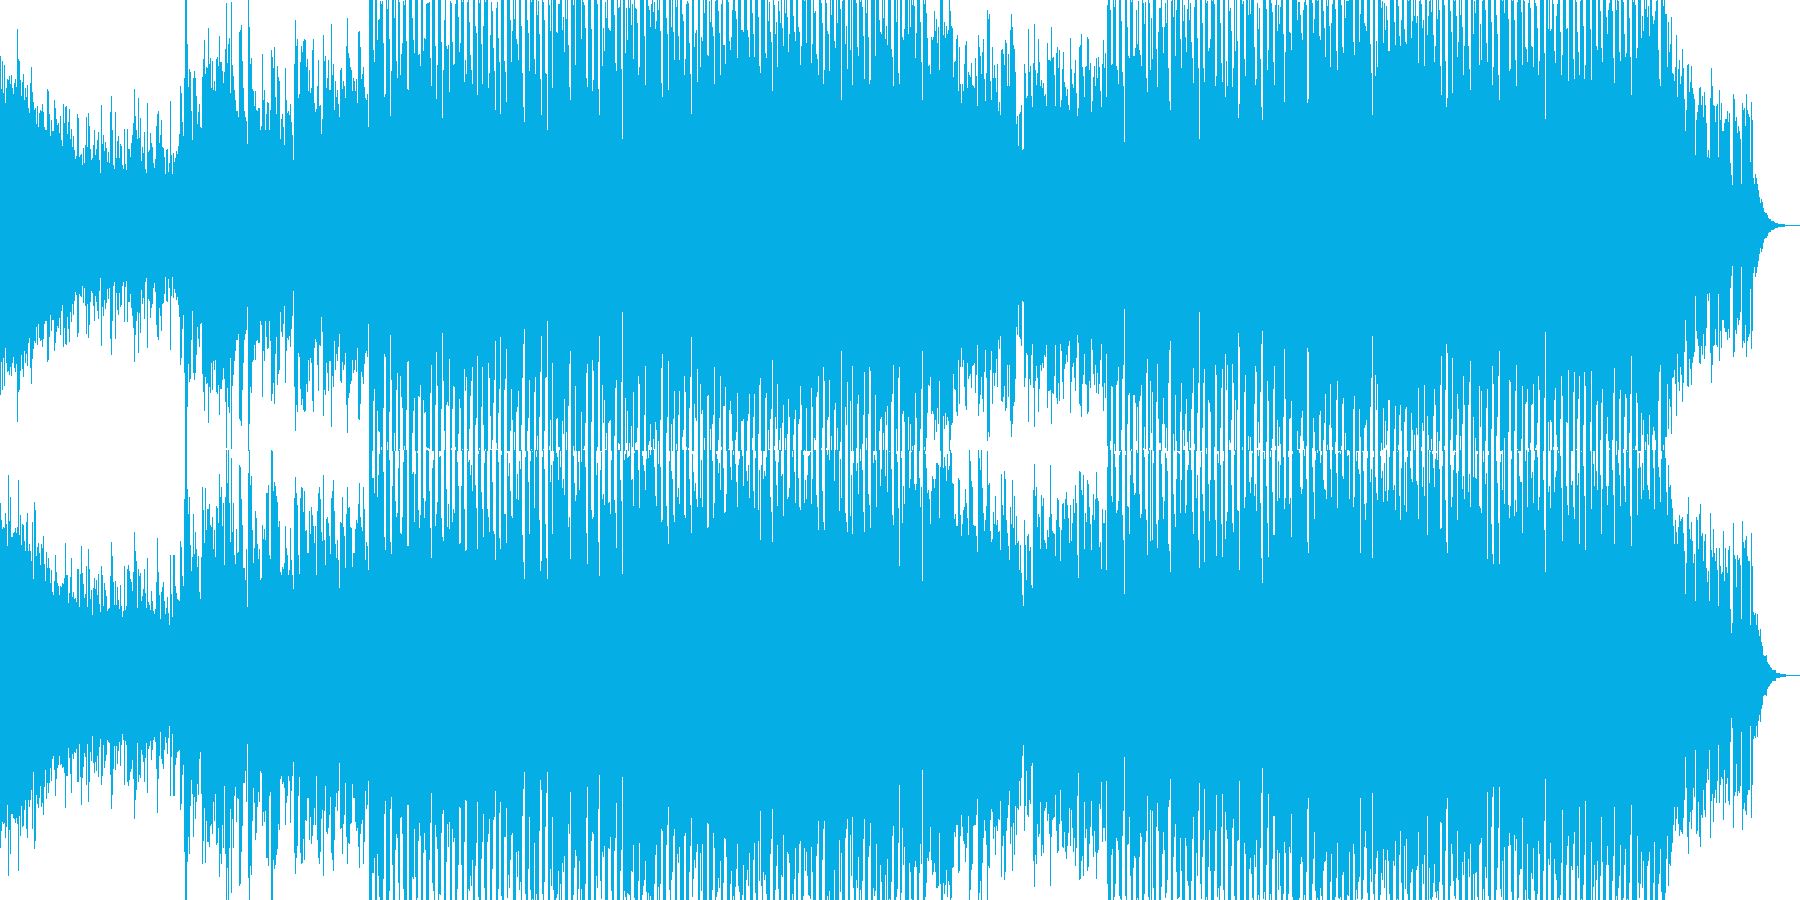 EDMクラブ系ダンスミュージック-80の再生済みの波形